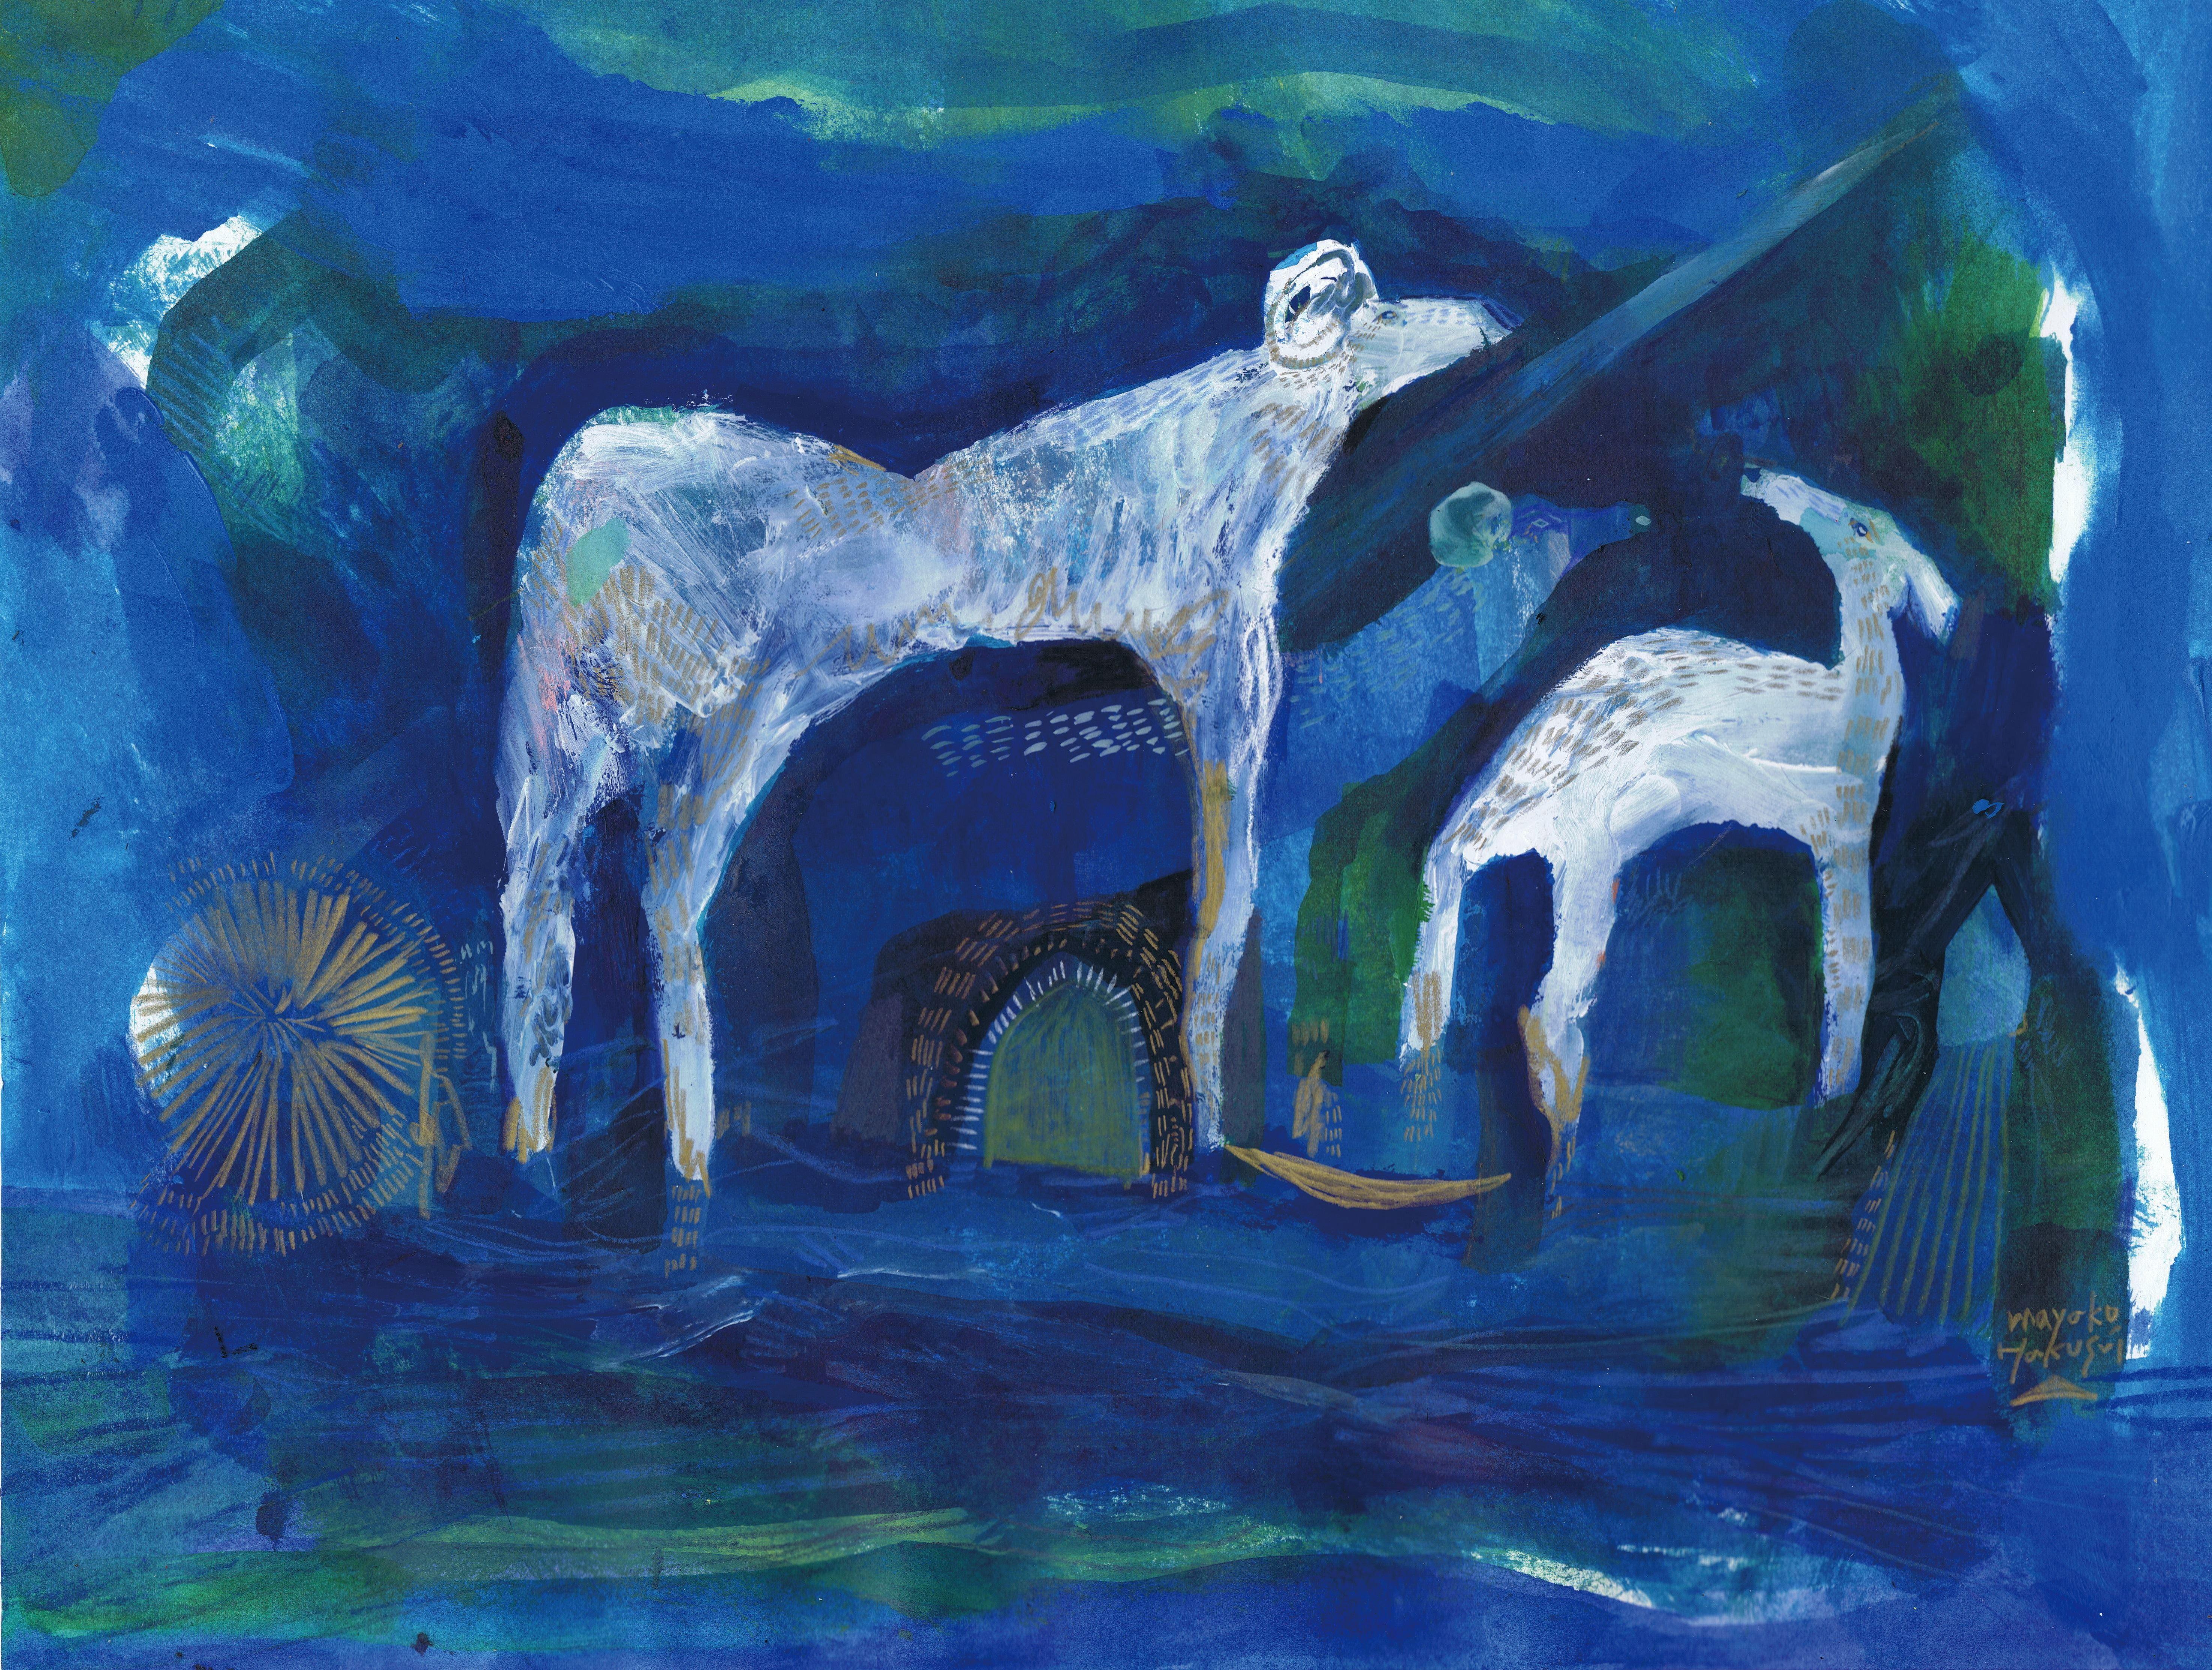 BLUE/BY THE WATER/PRAYER 14.-21.6.2018 | Ateljee Asta Pulkkinen